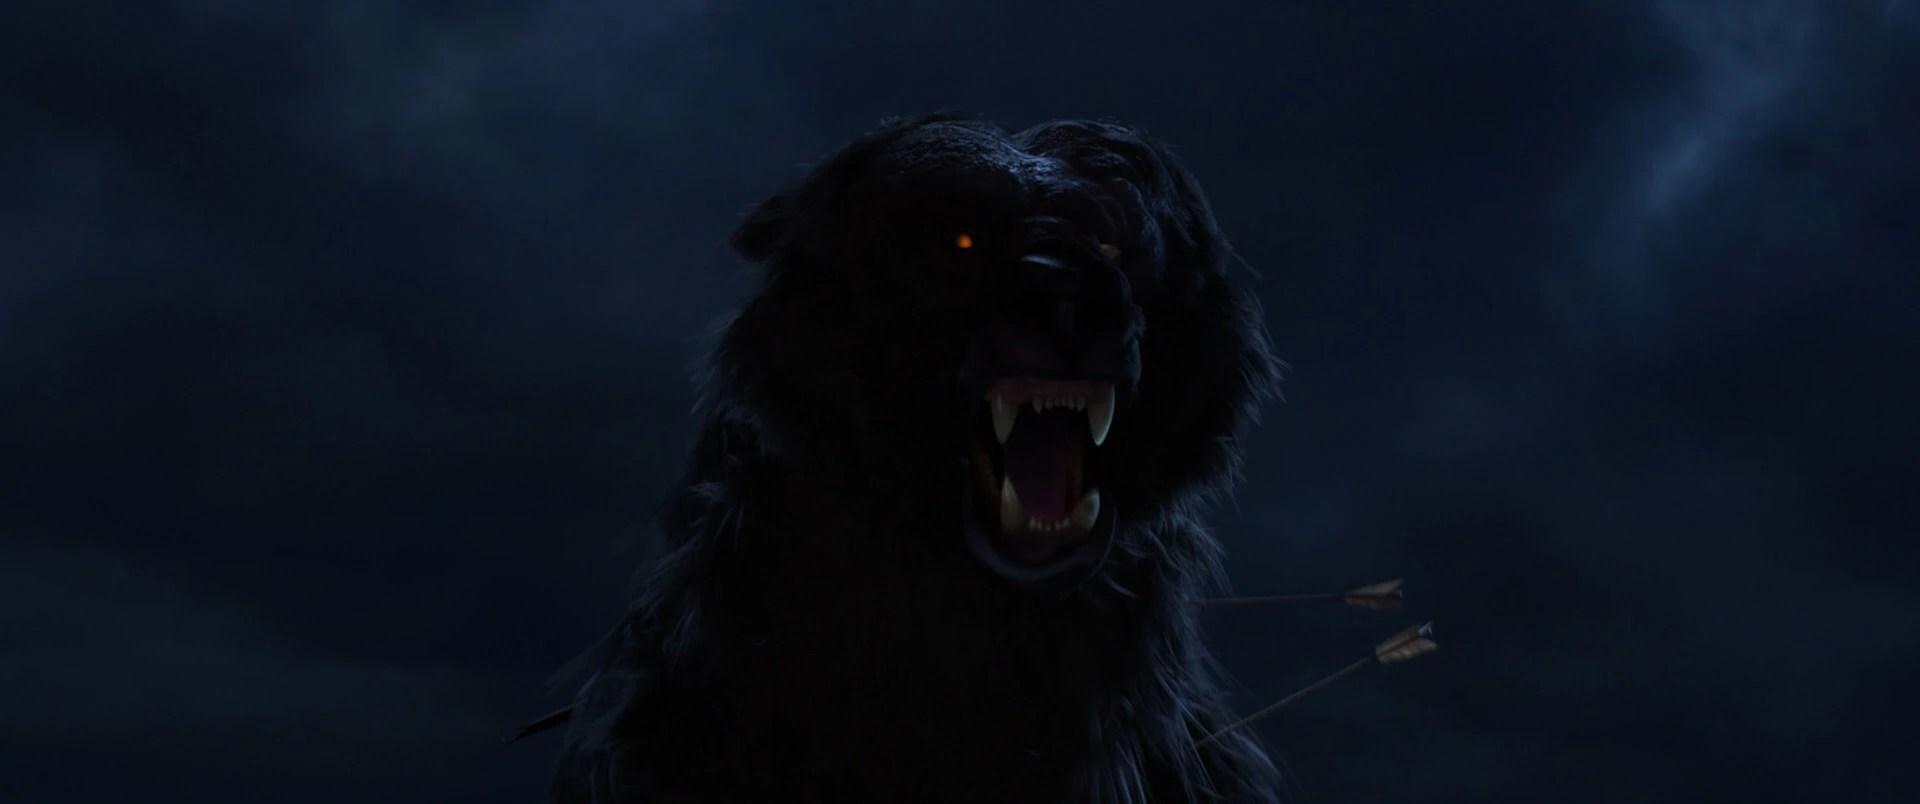 brave movie demon bear - photo #11